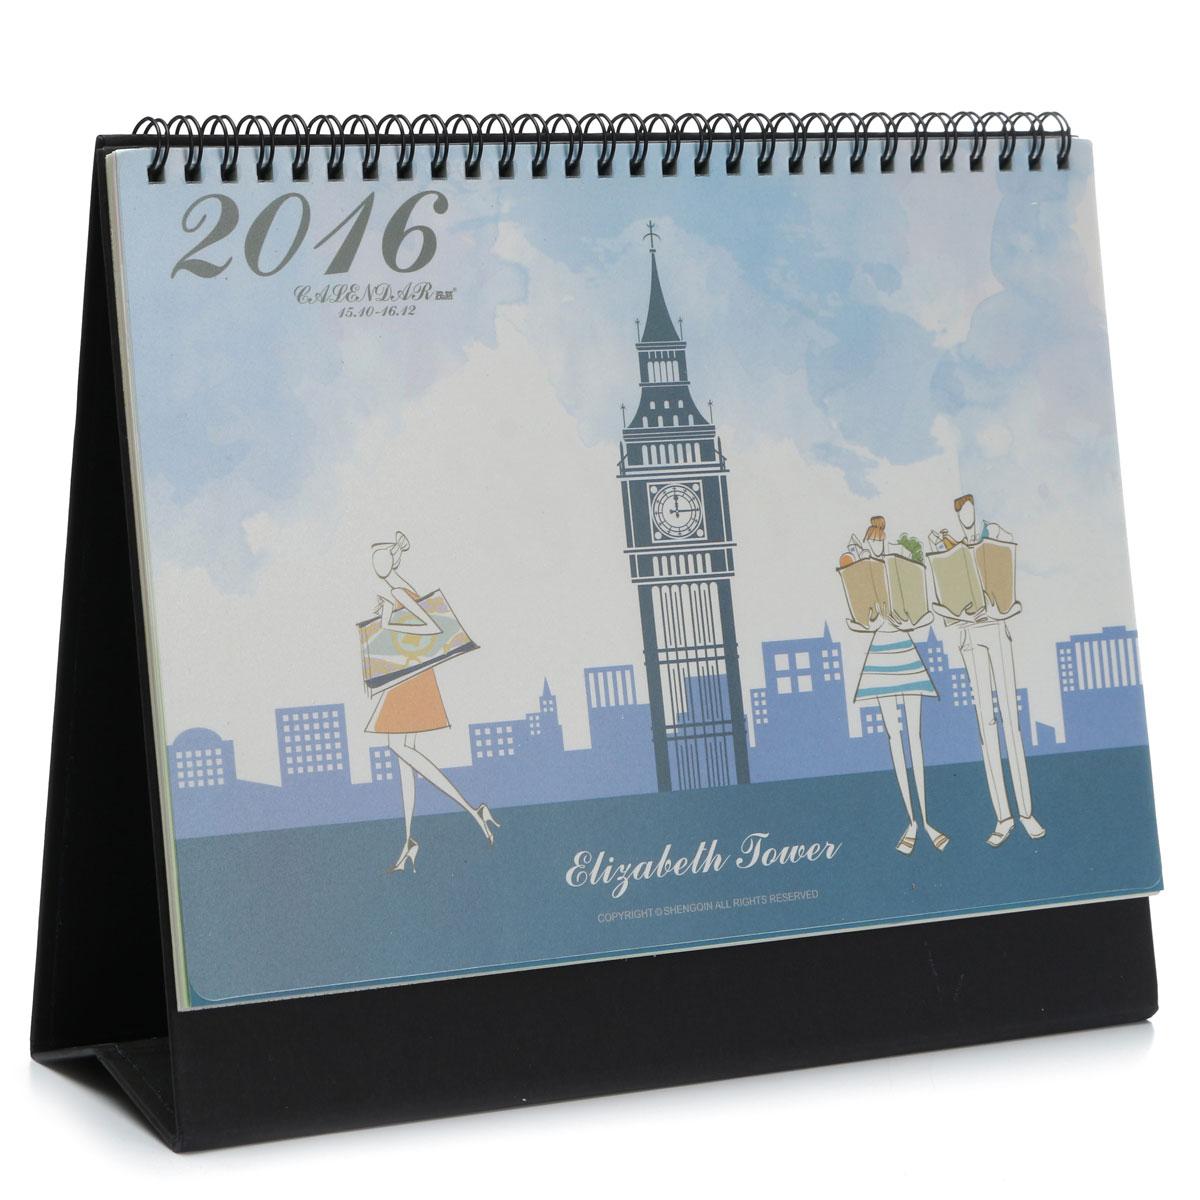 2016 calendar table calendar desk planner agenda stationery big ben